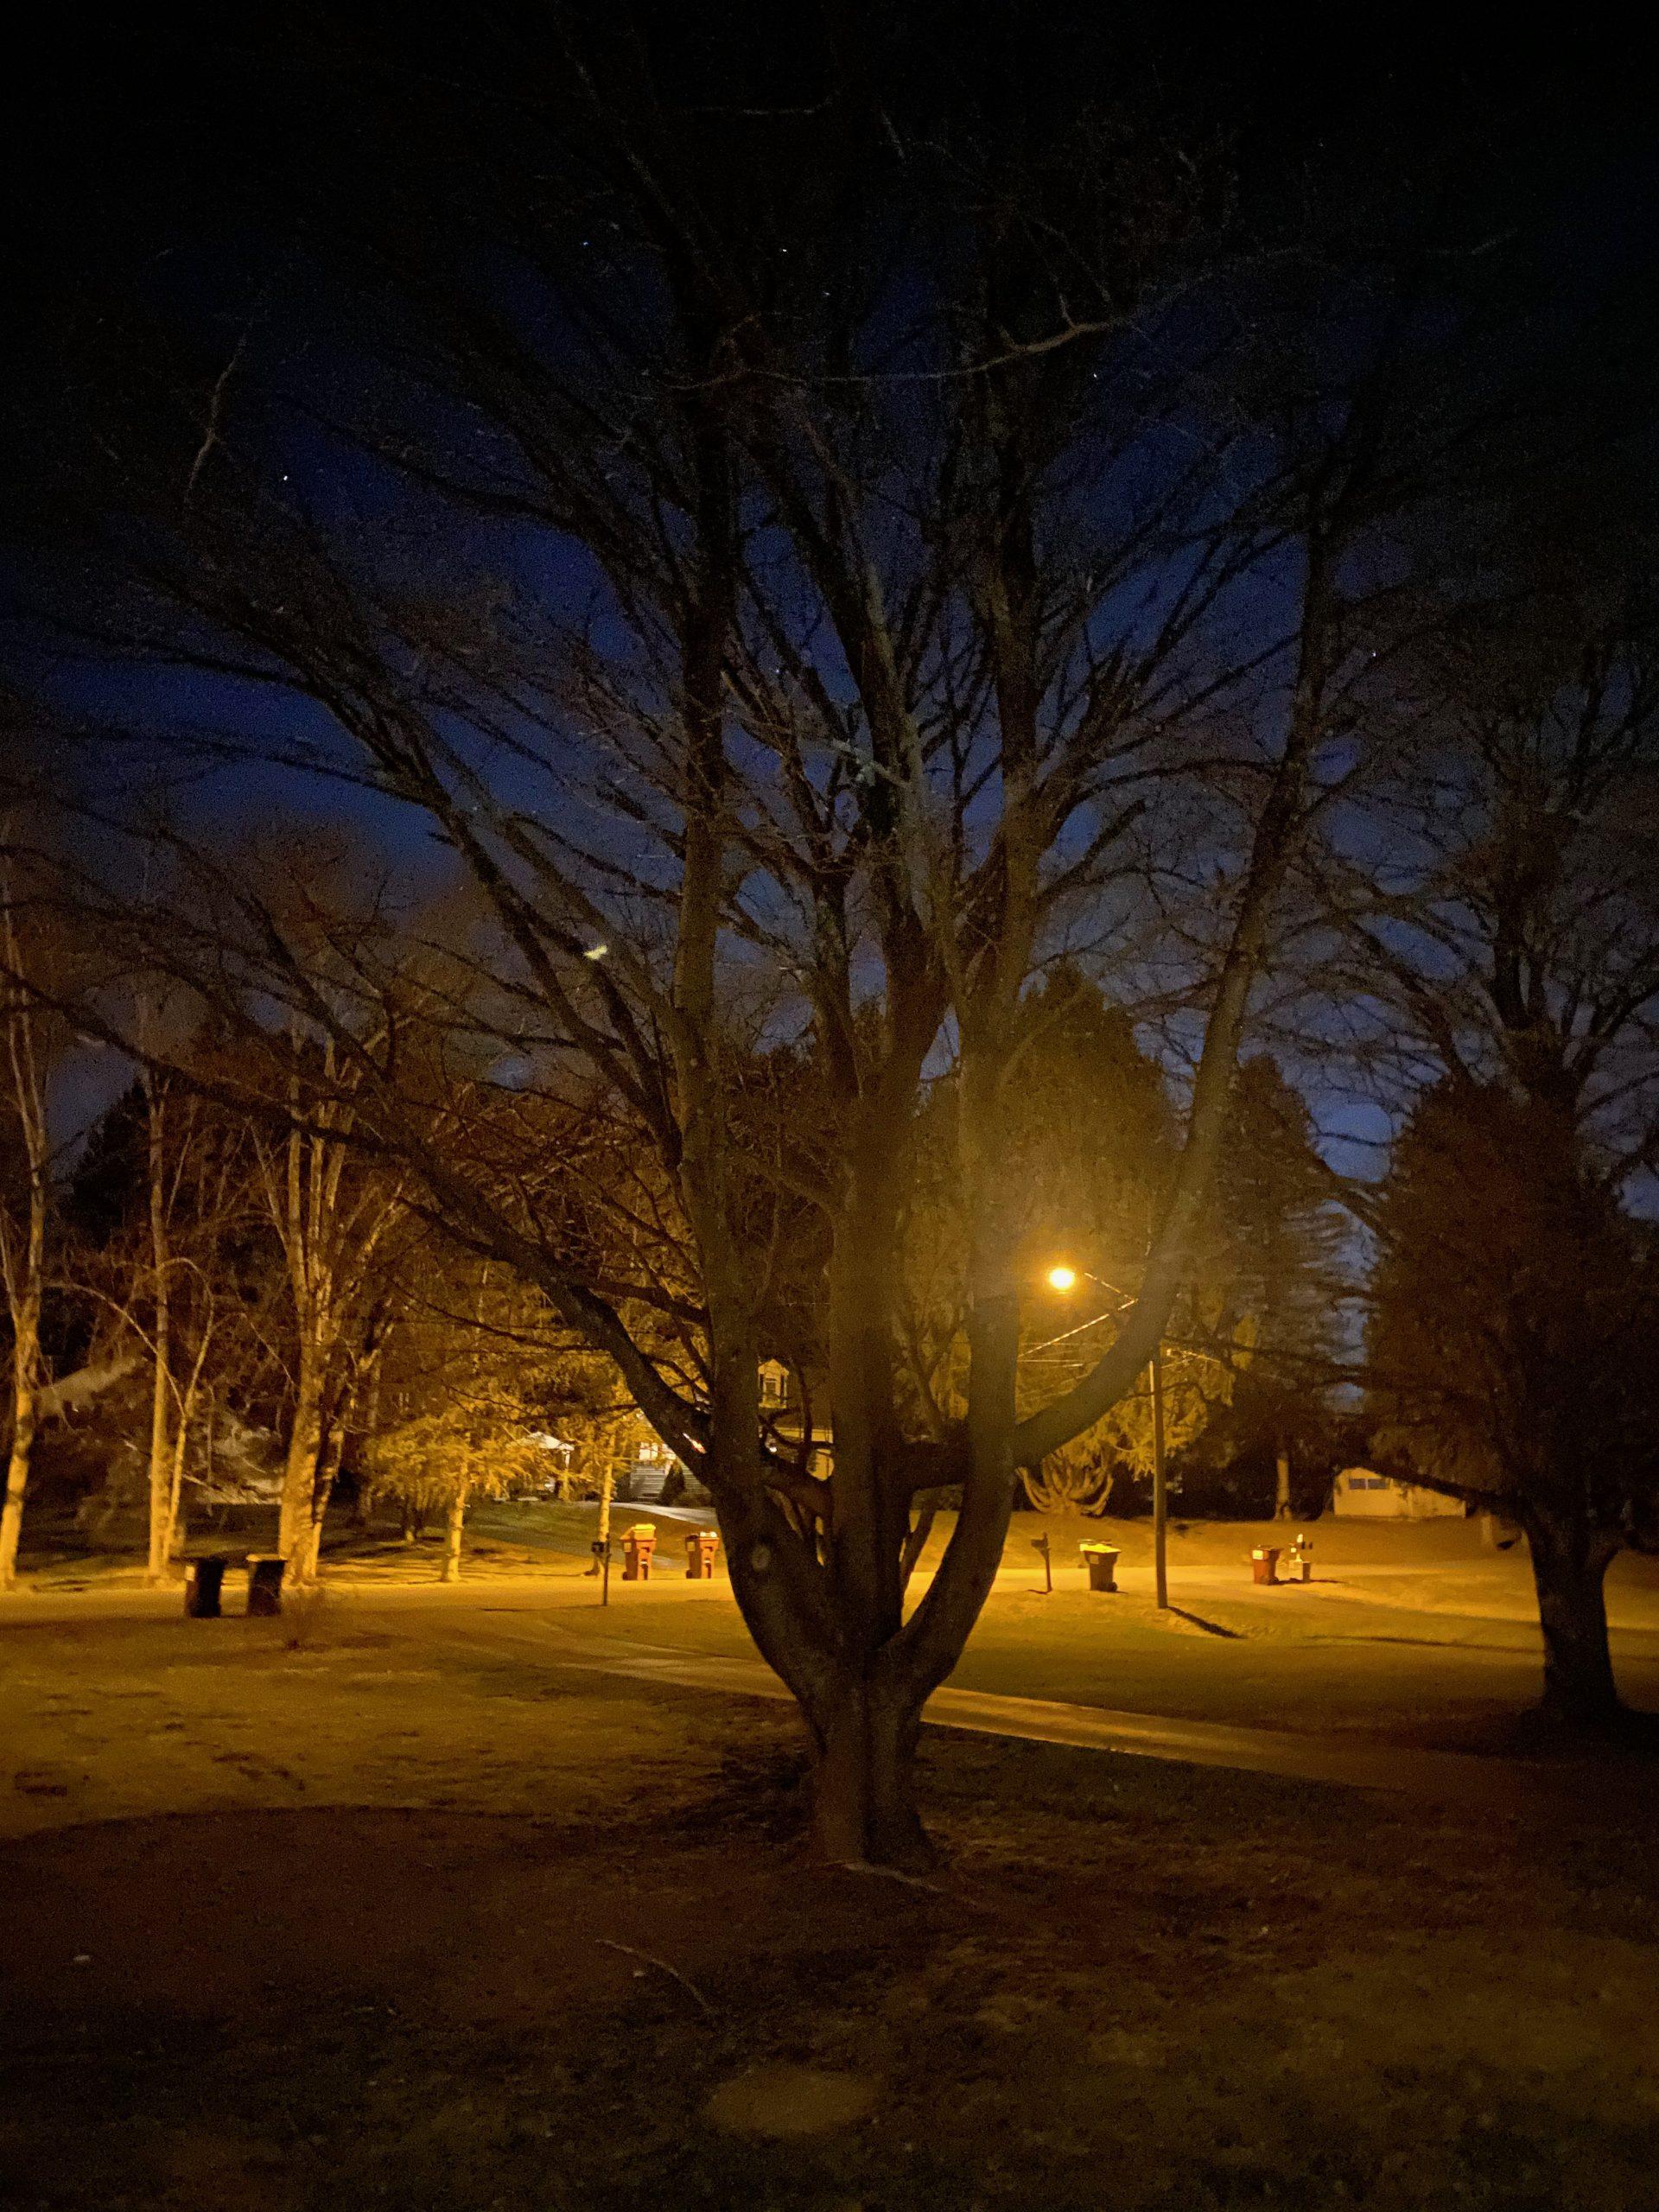 A tree in wynantskill ny without any uplighting